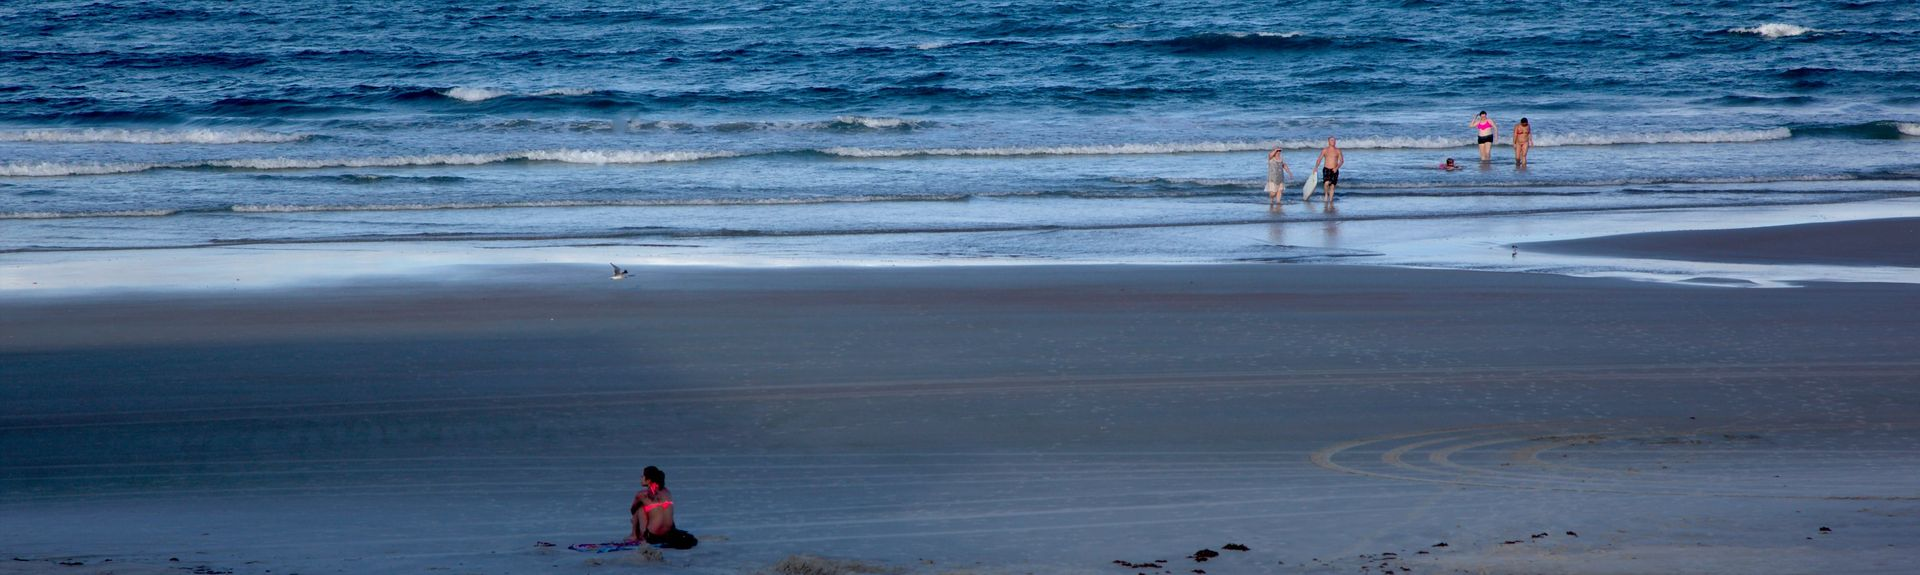 Sunglow Resort Condo, Daytona Beach Shores, FL, USA